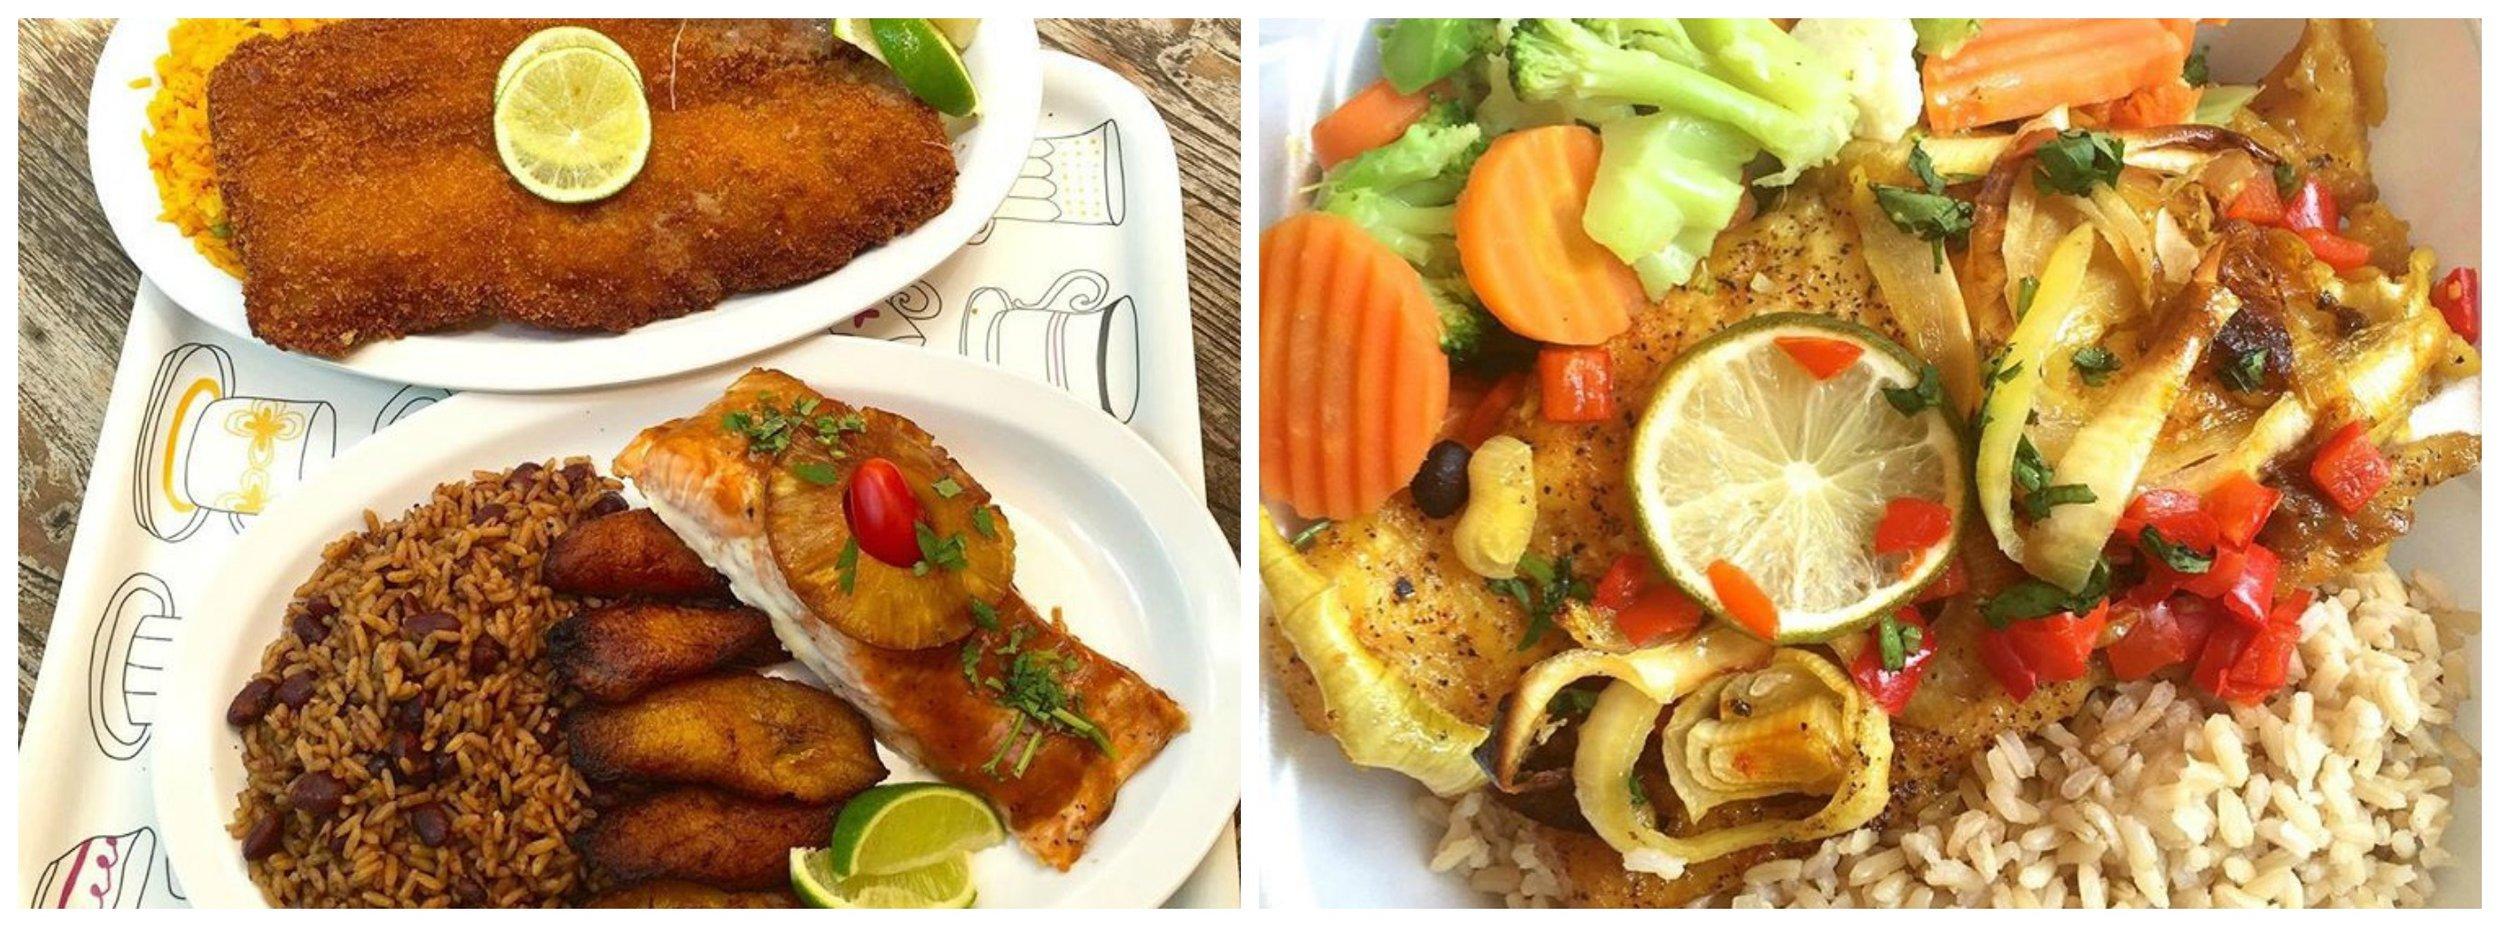 Palmas Cafe Brickell Latin Food